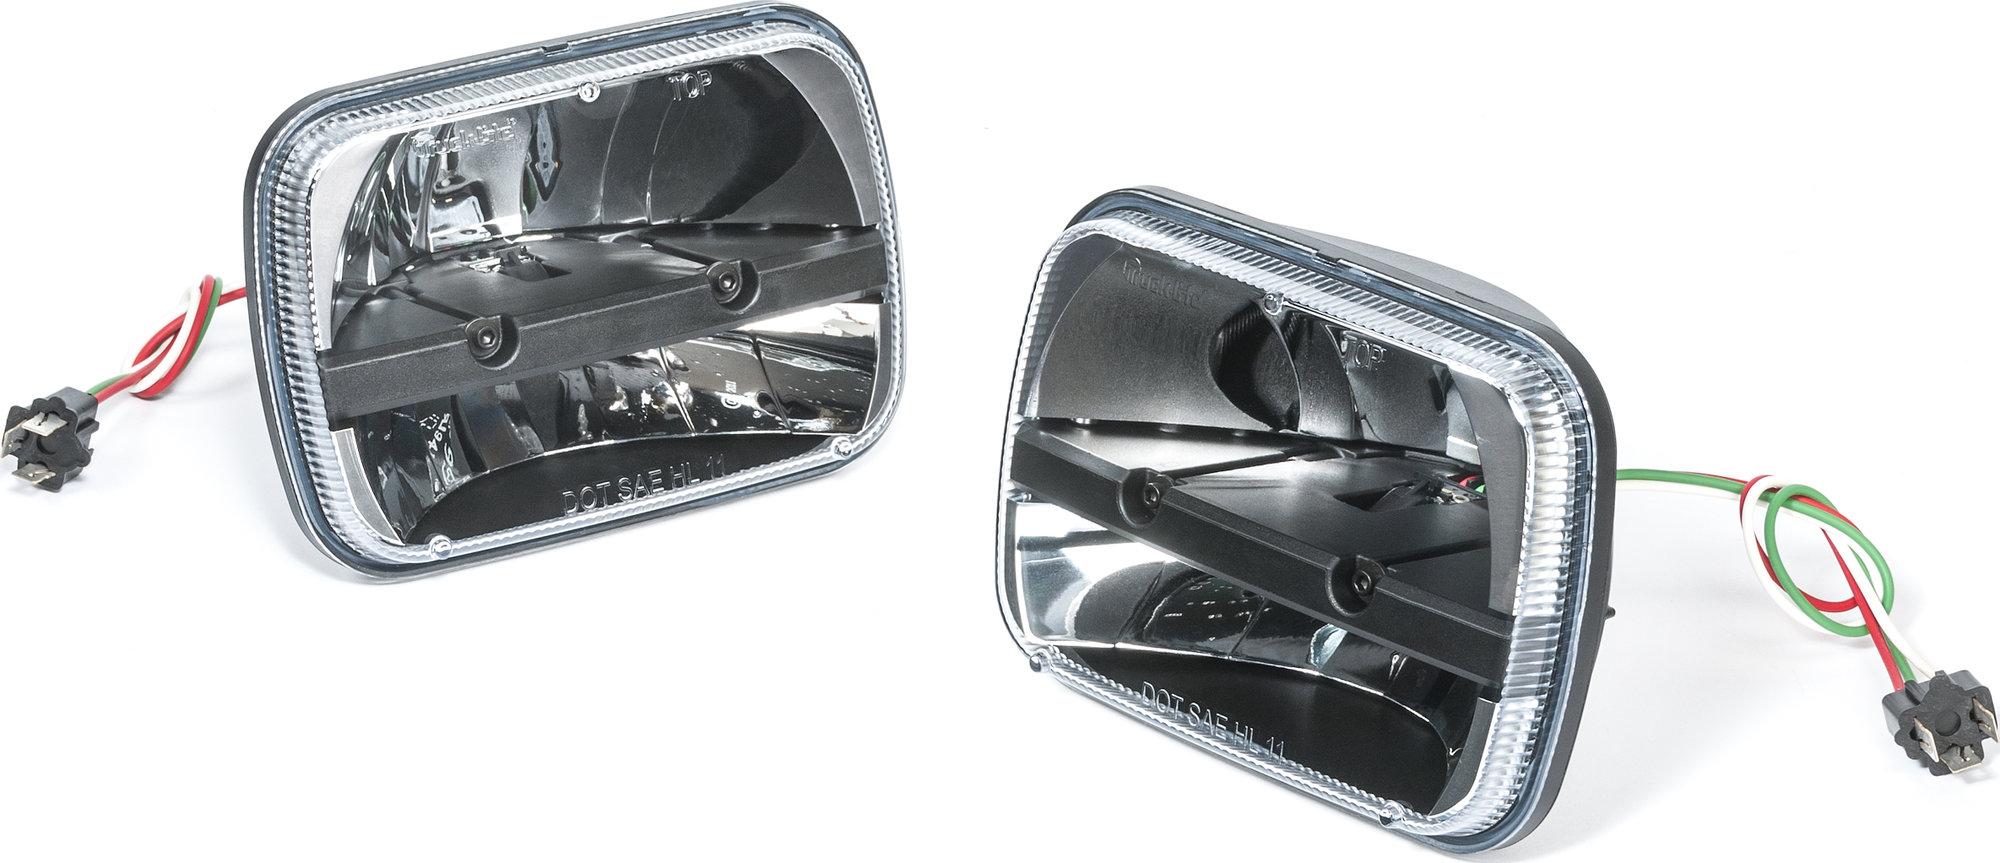 truck lite led headlight wiring diagram john deere saber m jeep xj headlights h like 1999 cherokee